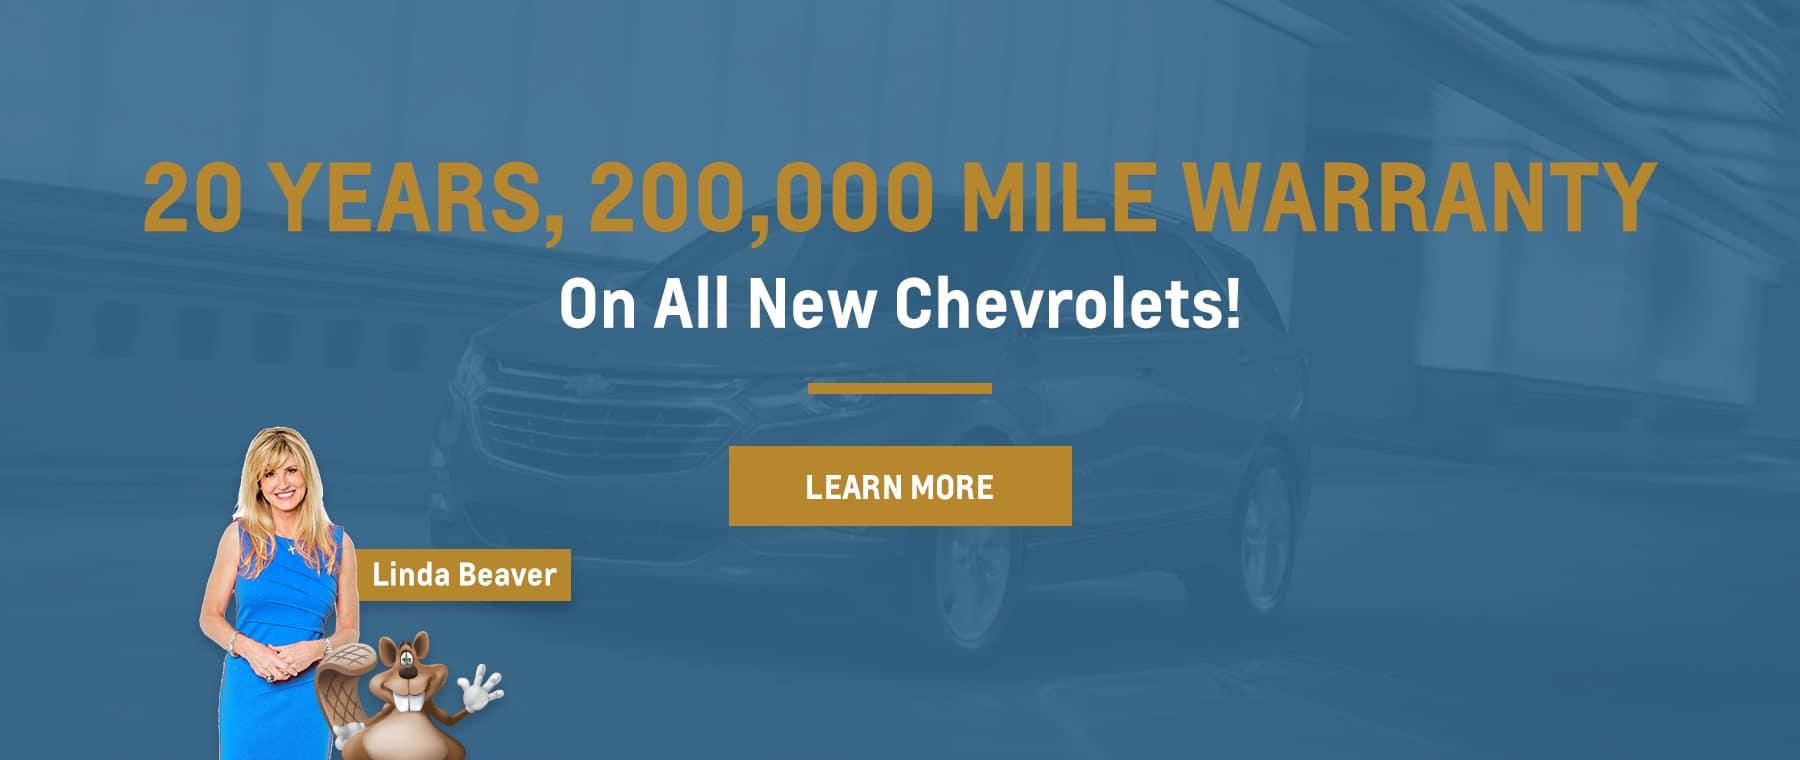 20 Year, 200,000 Mile Warranty Hero Background